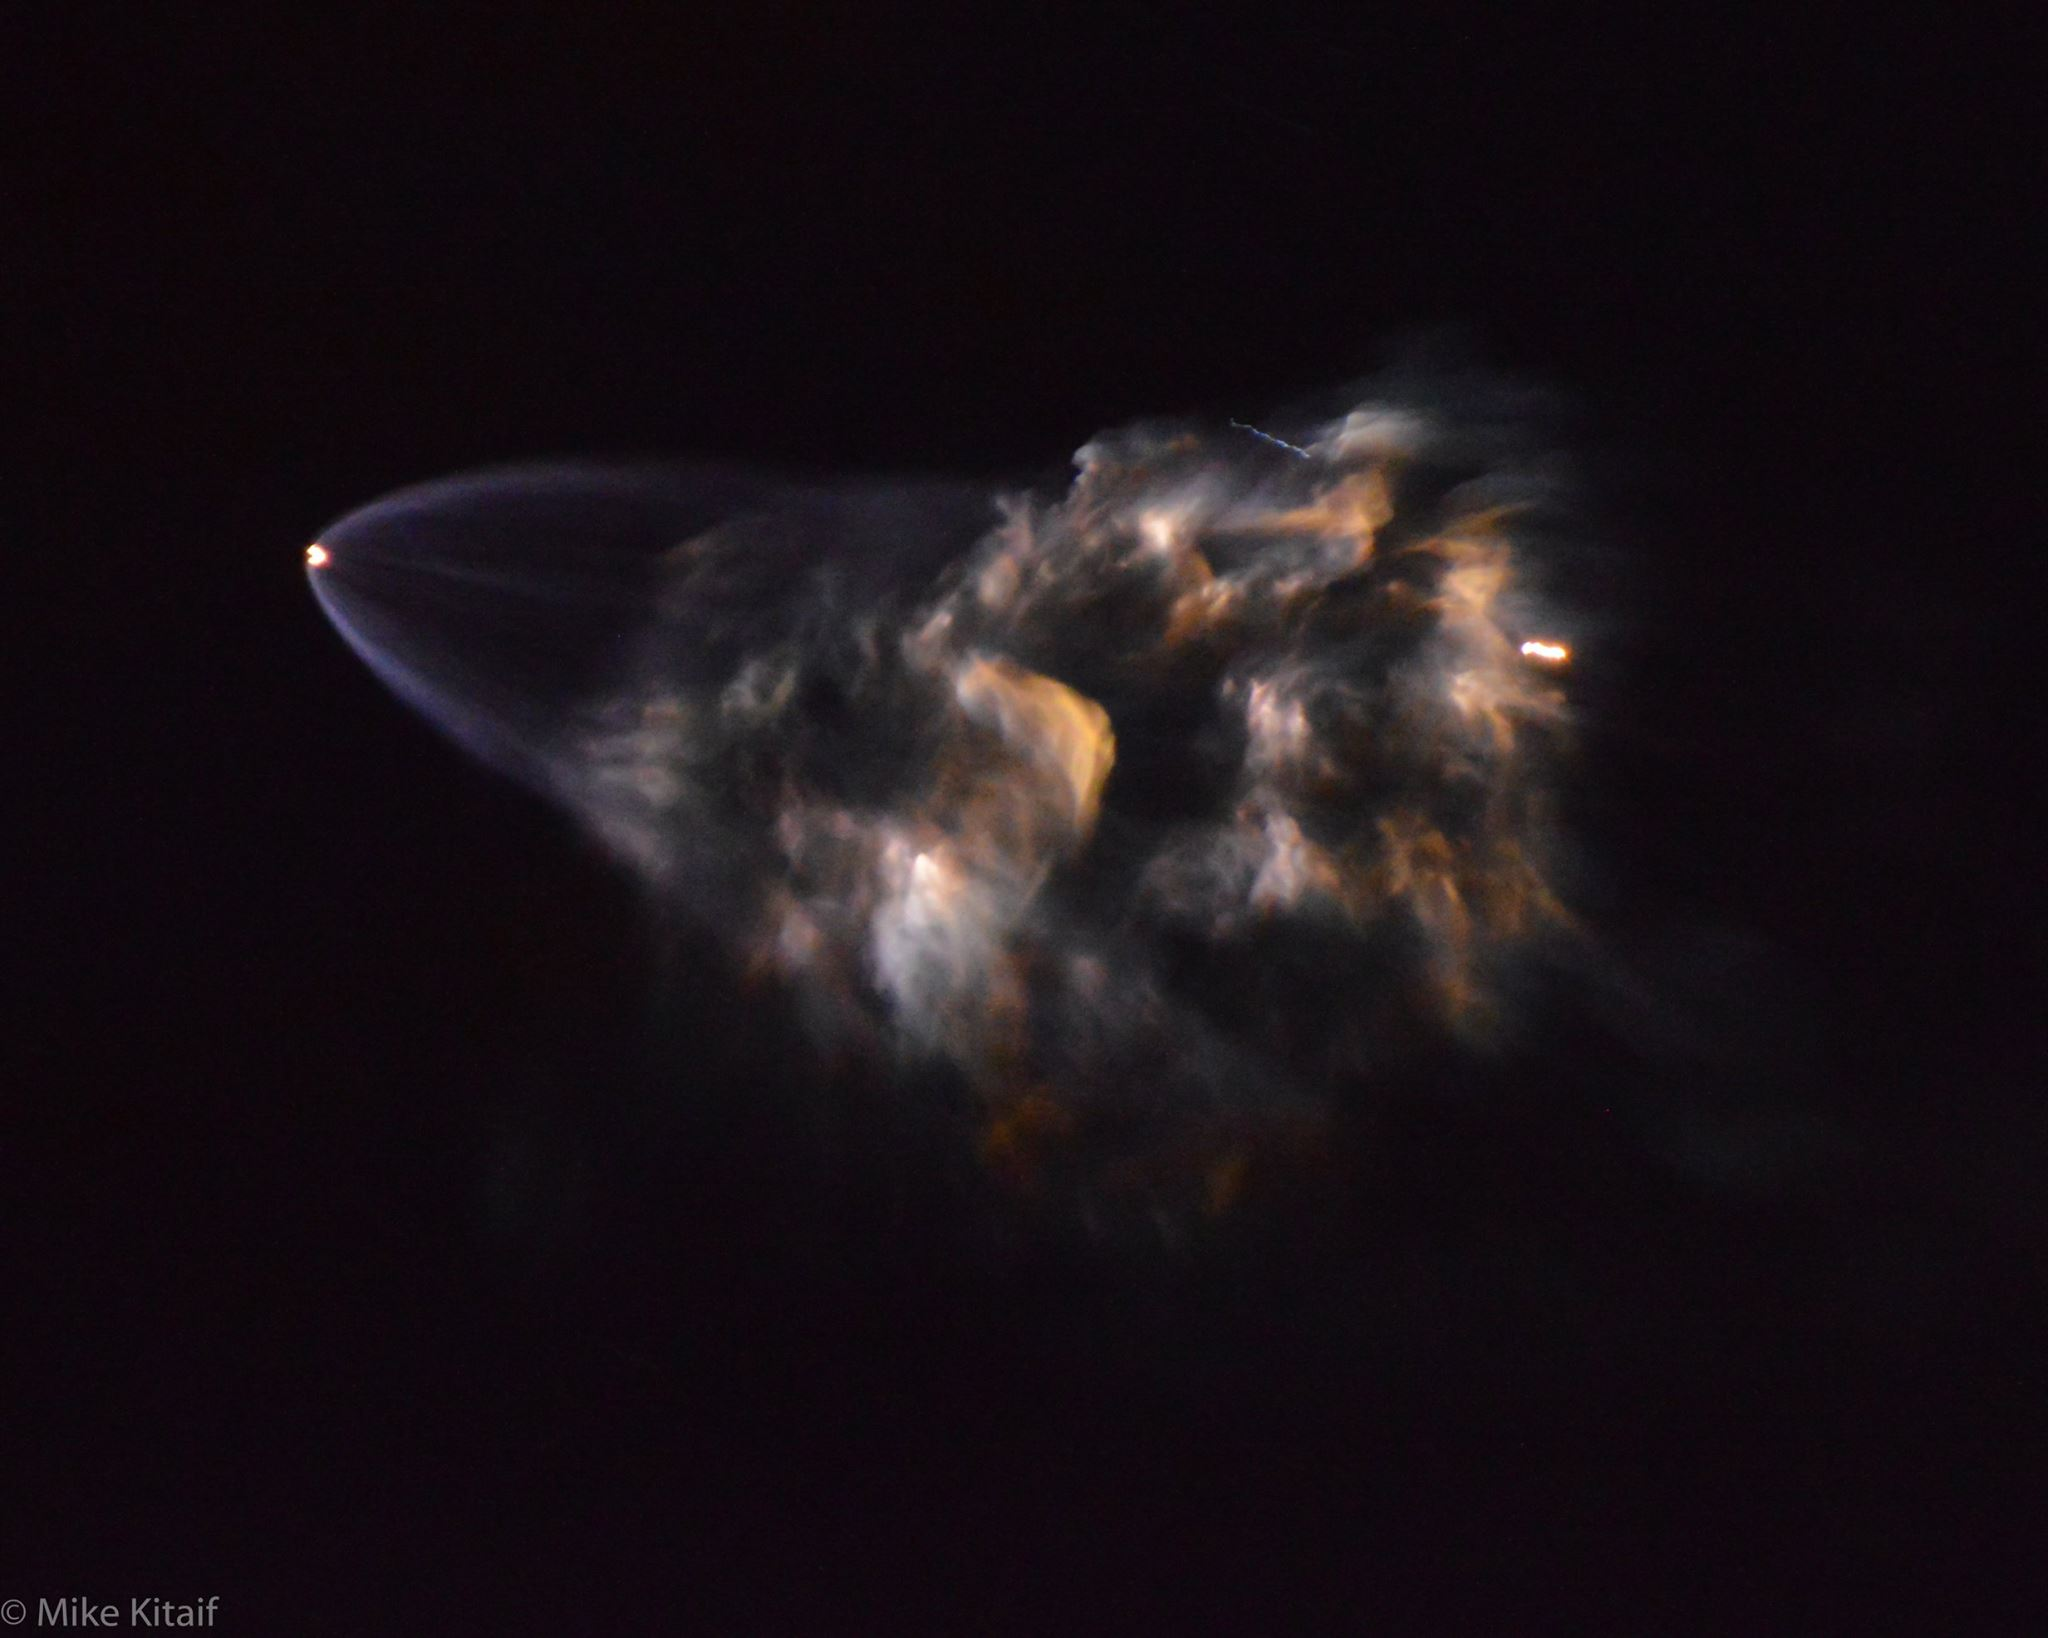 Илон Маск объявил о полёте Дракона к Луне